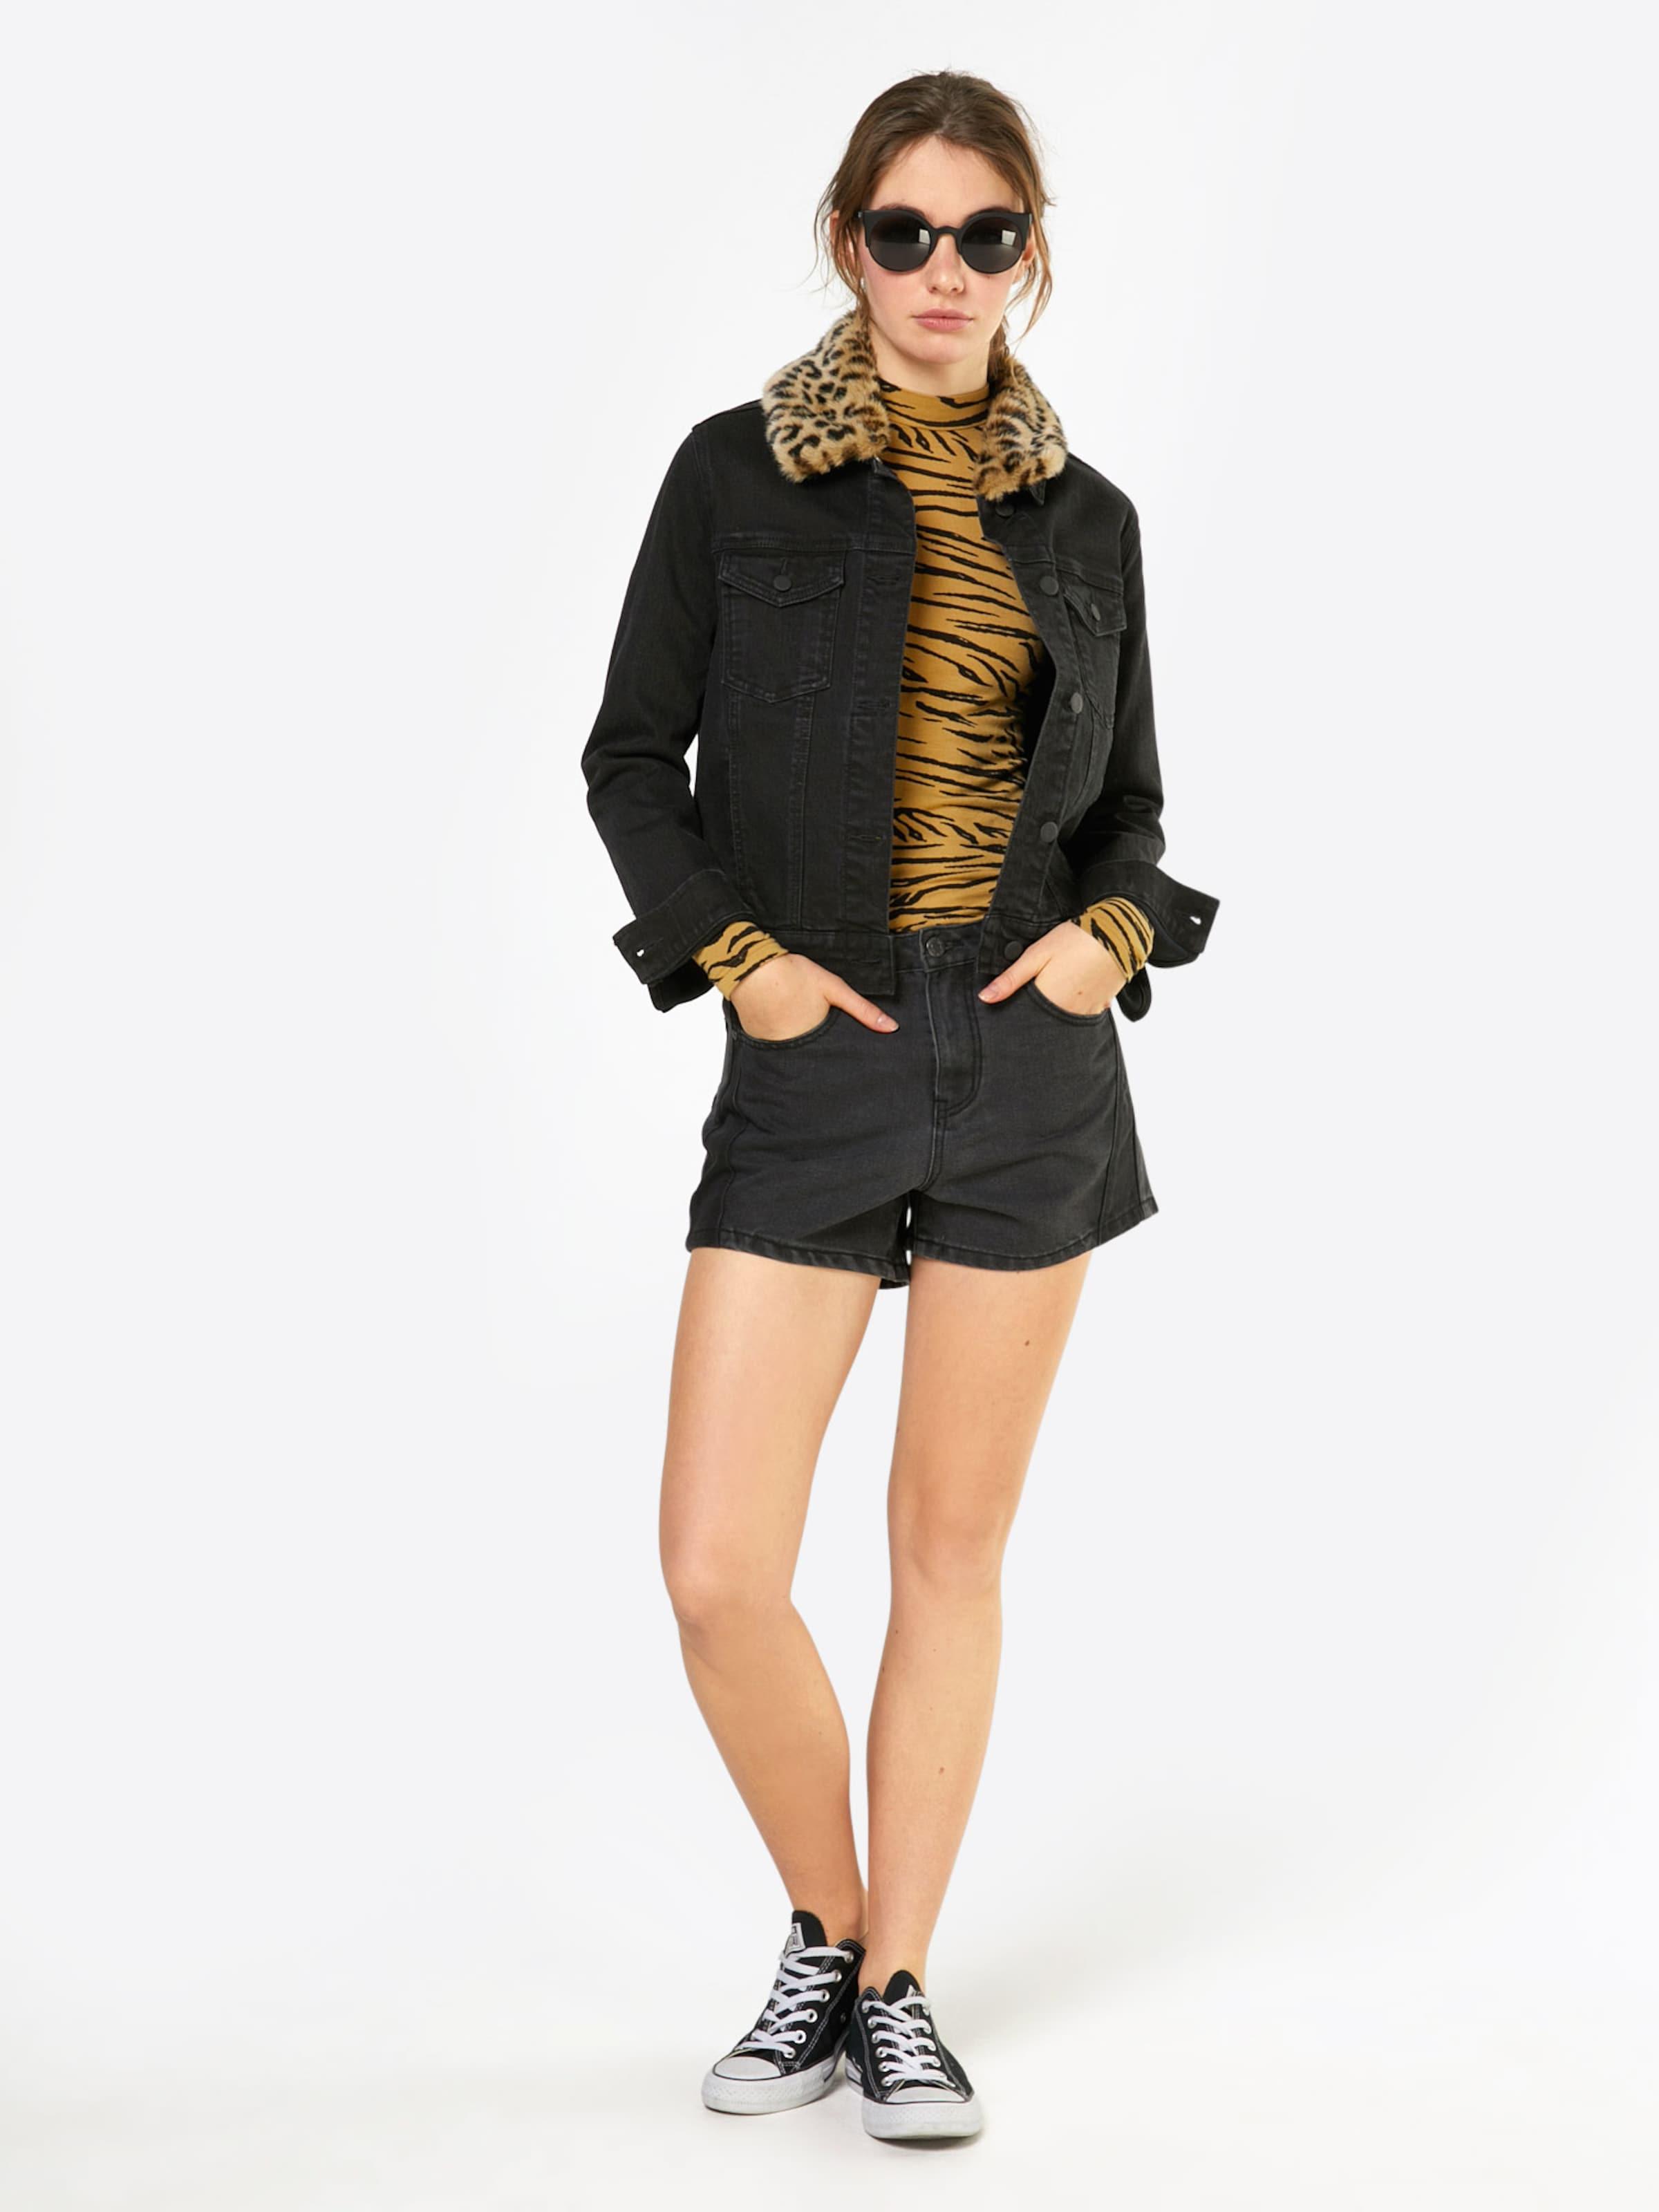 Shorts May Noisy In Black 'cutline' Denim CBordxe